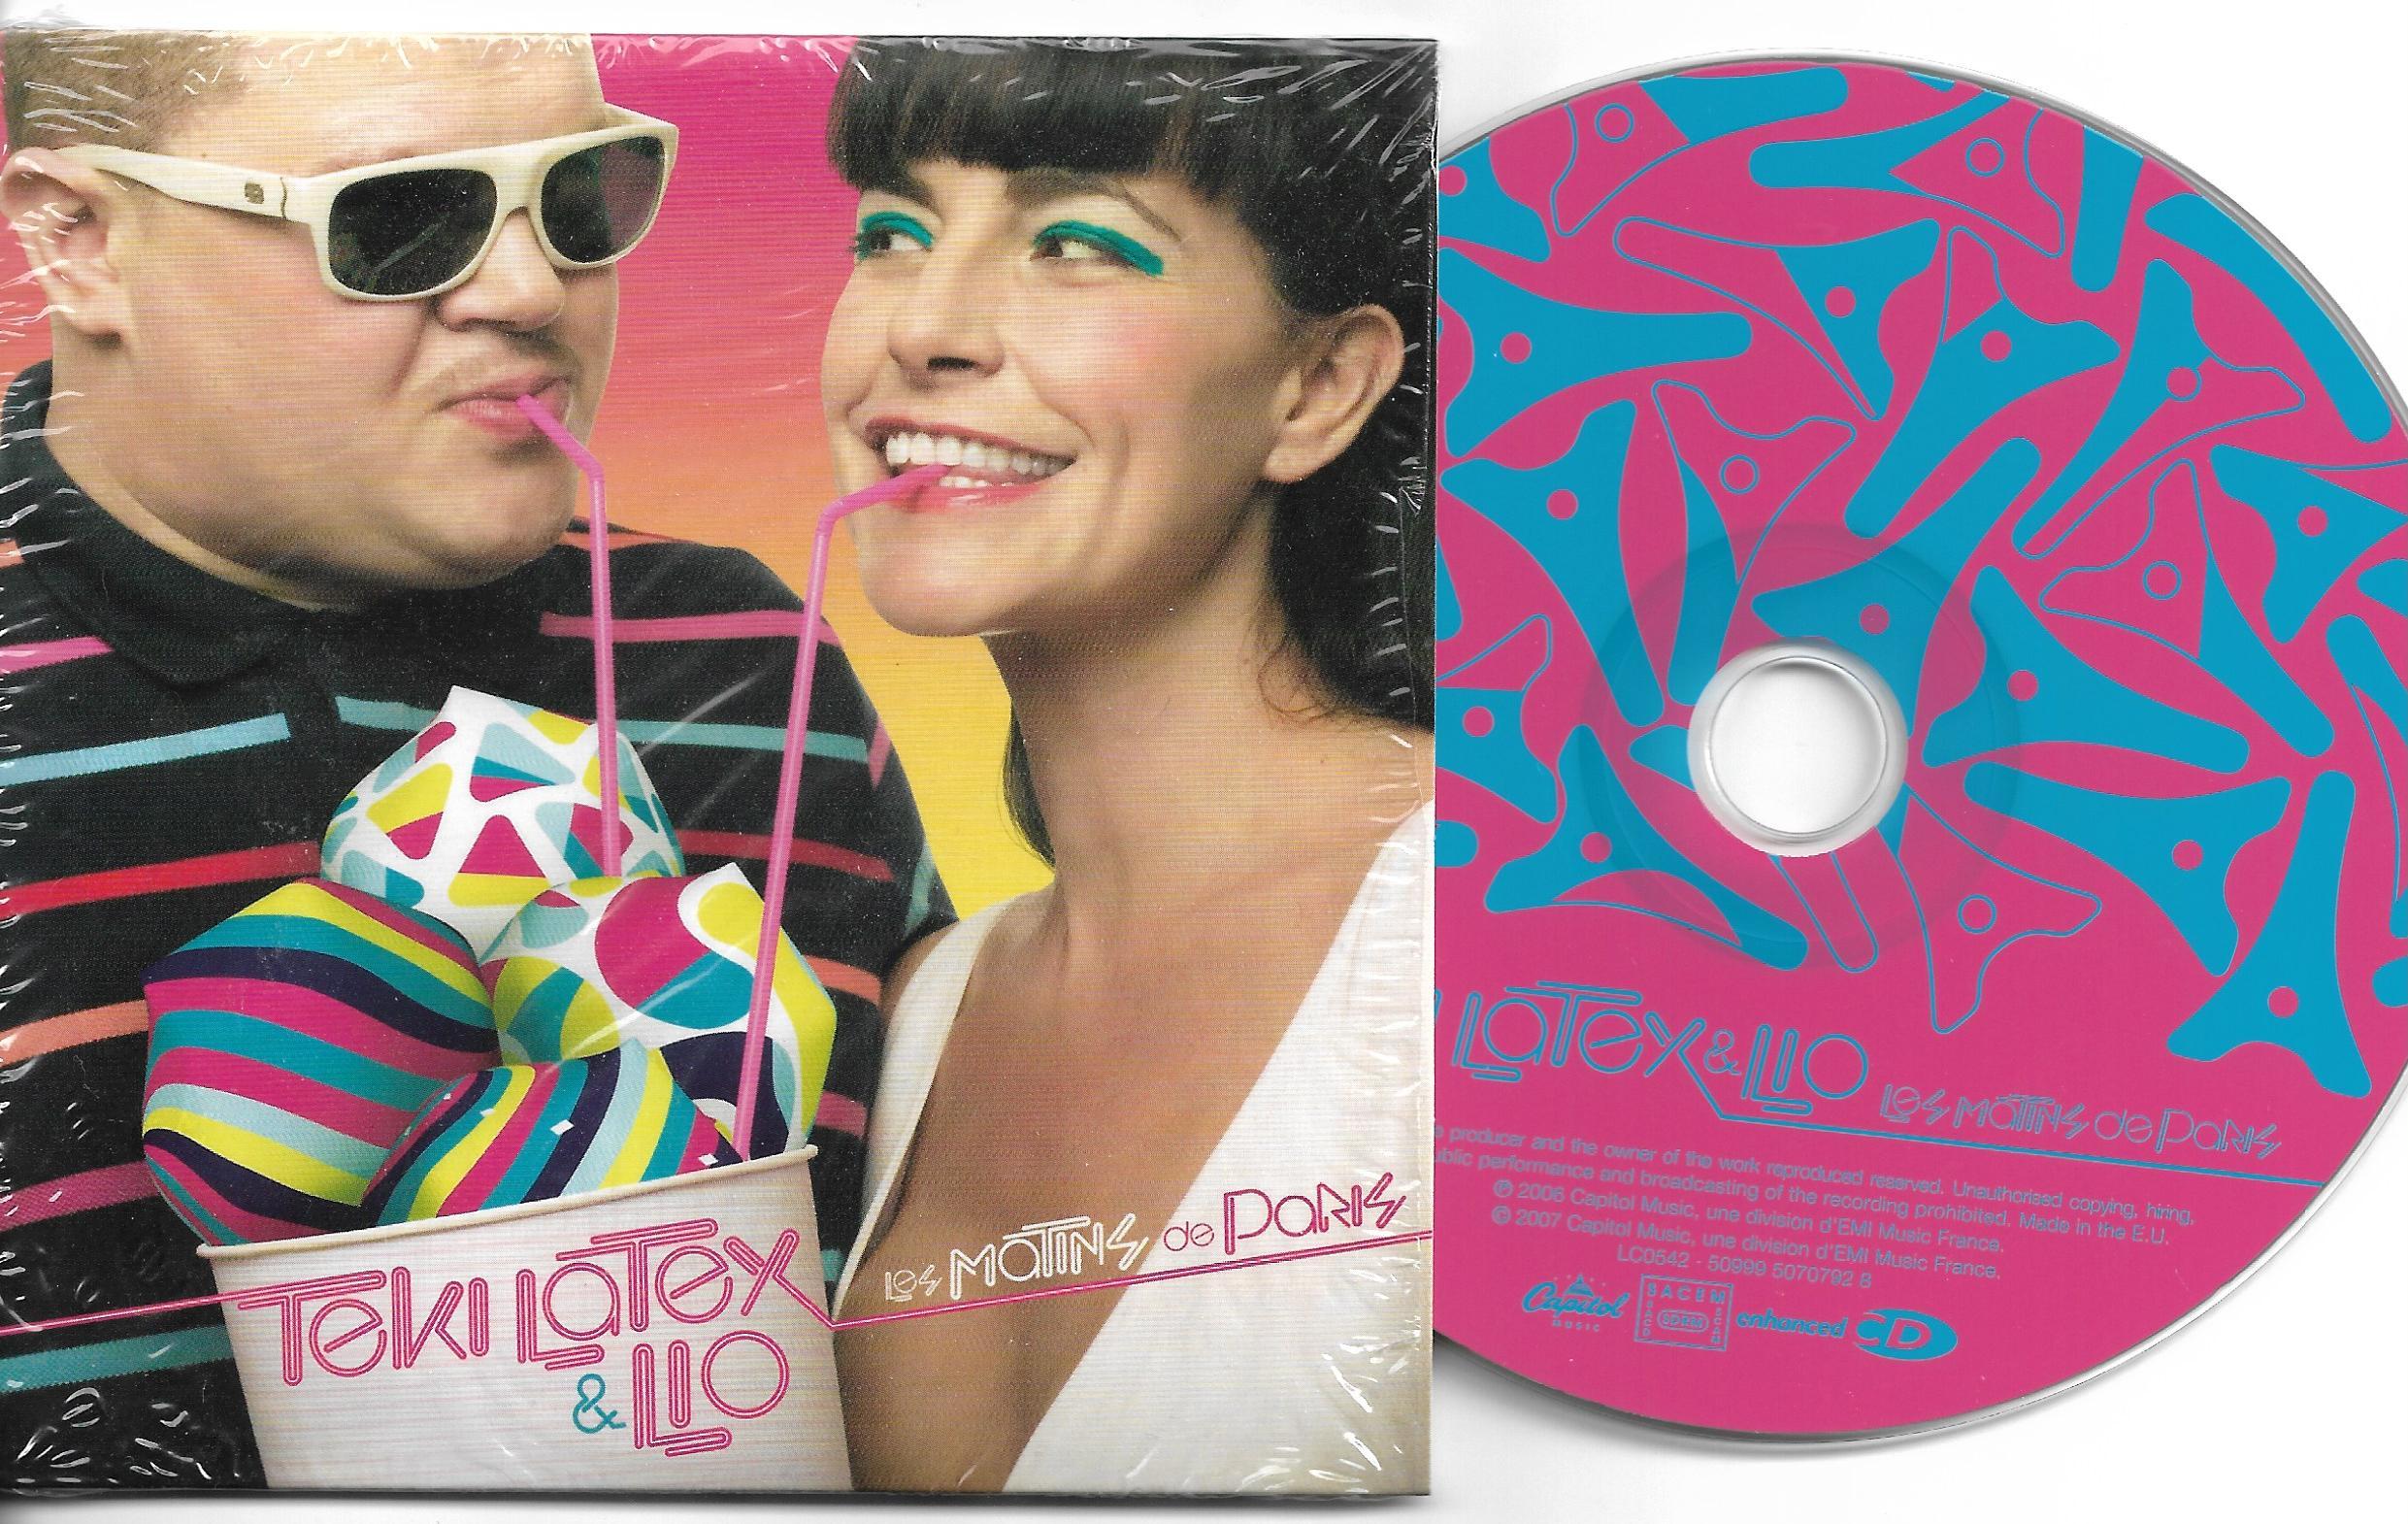 LIO & TEKI LATEX - Les matins de Paris 3-track CARD SLEEVE - CD single